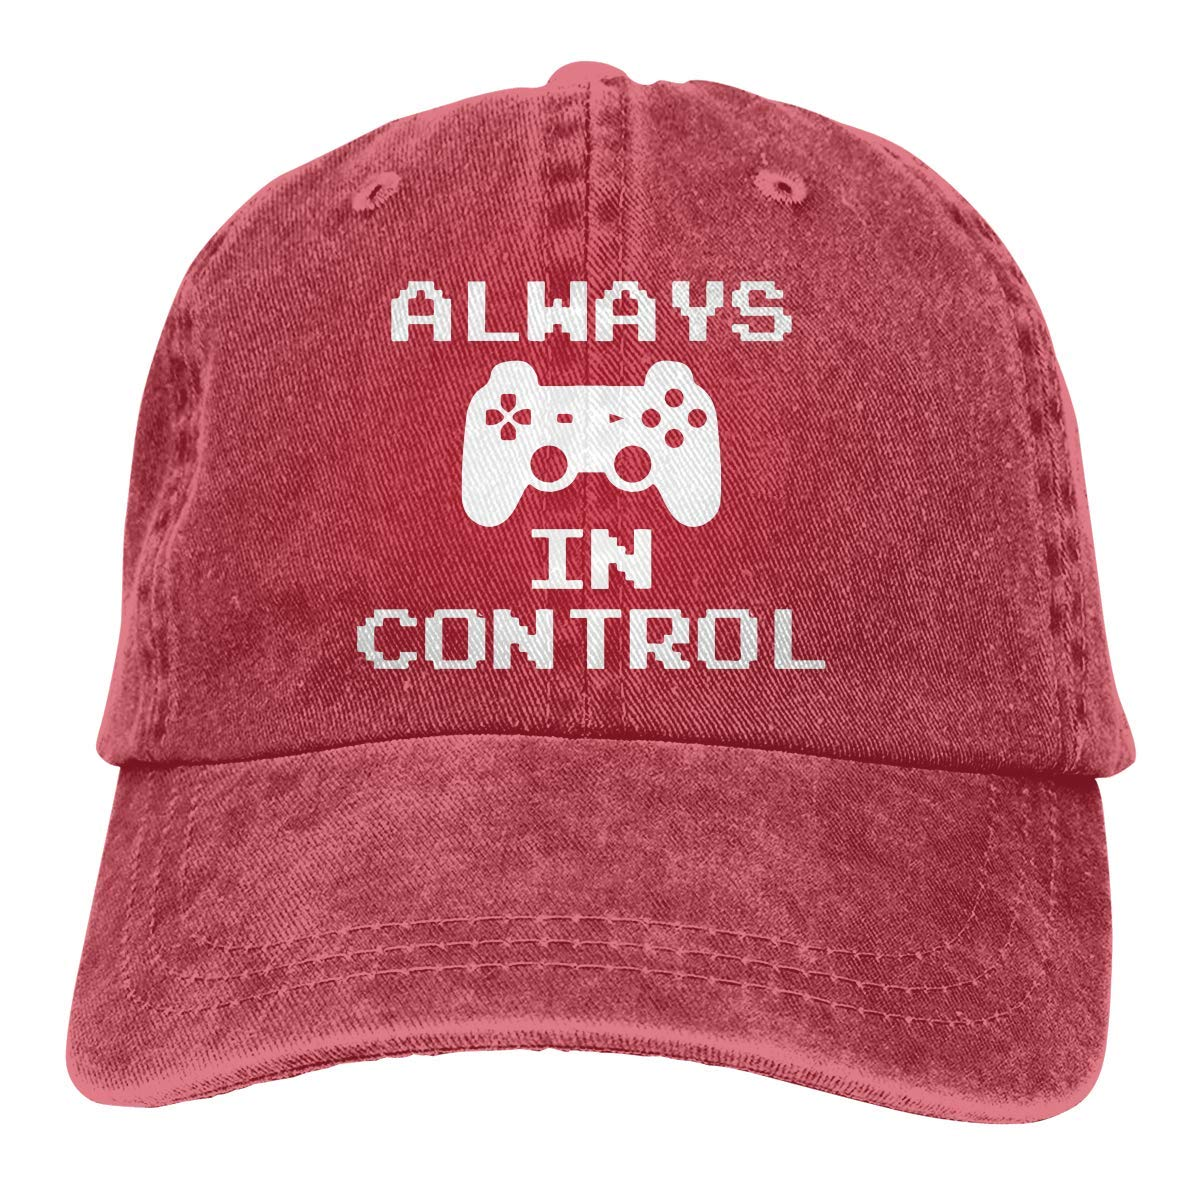 Hoklcvd Siempre en Control Gamer Unisex Washed Fashion Cowboy Hat ...